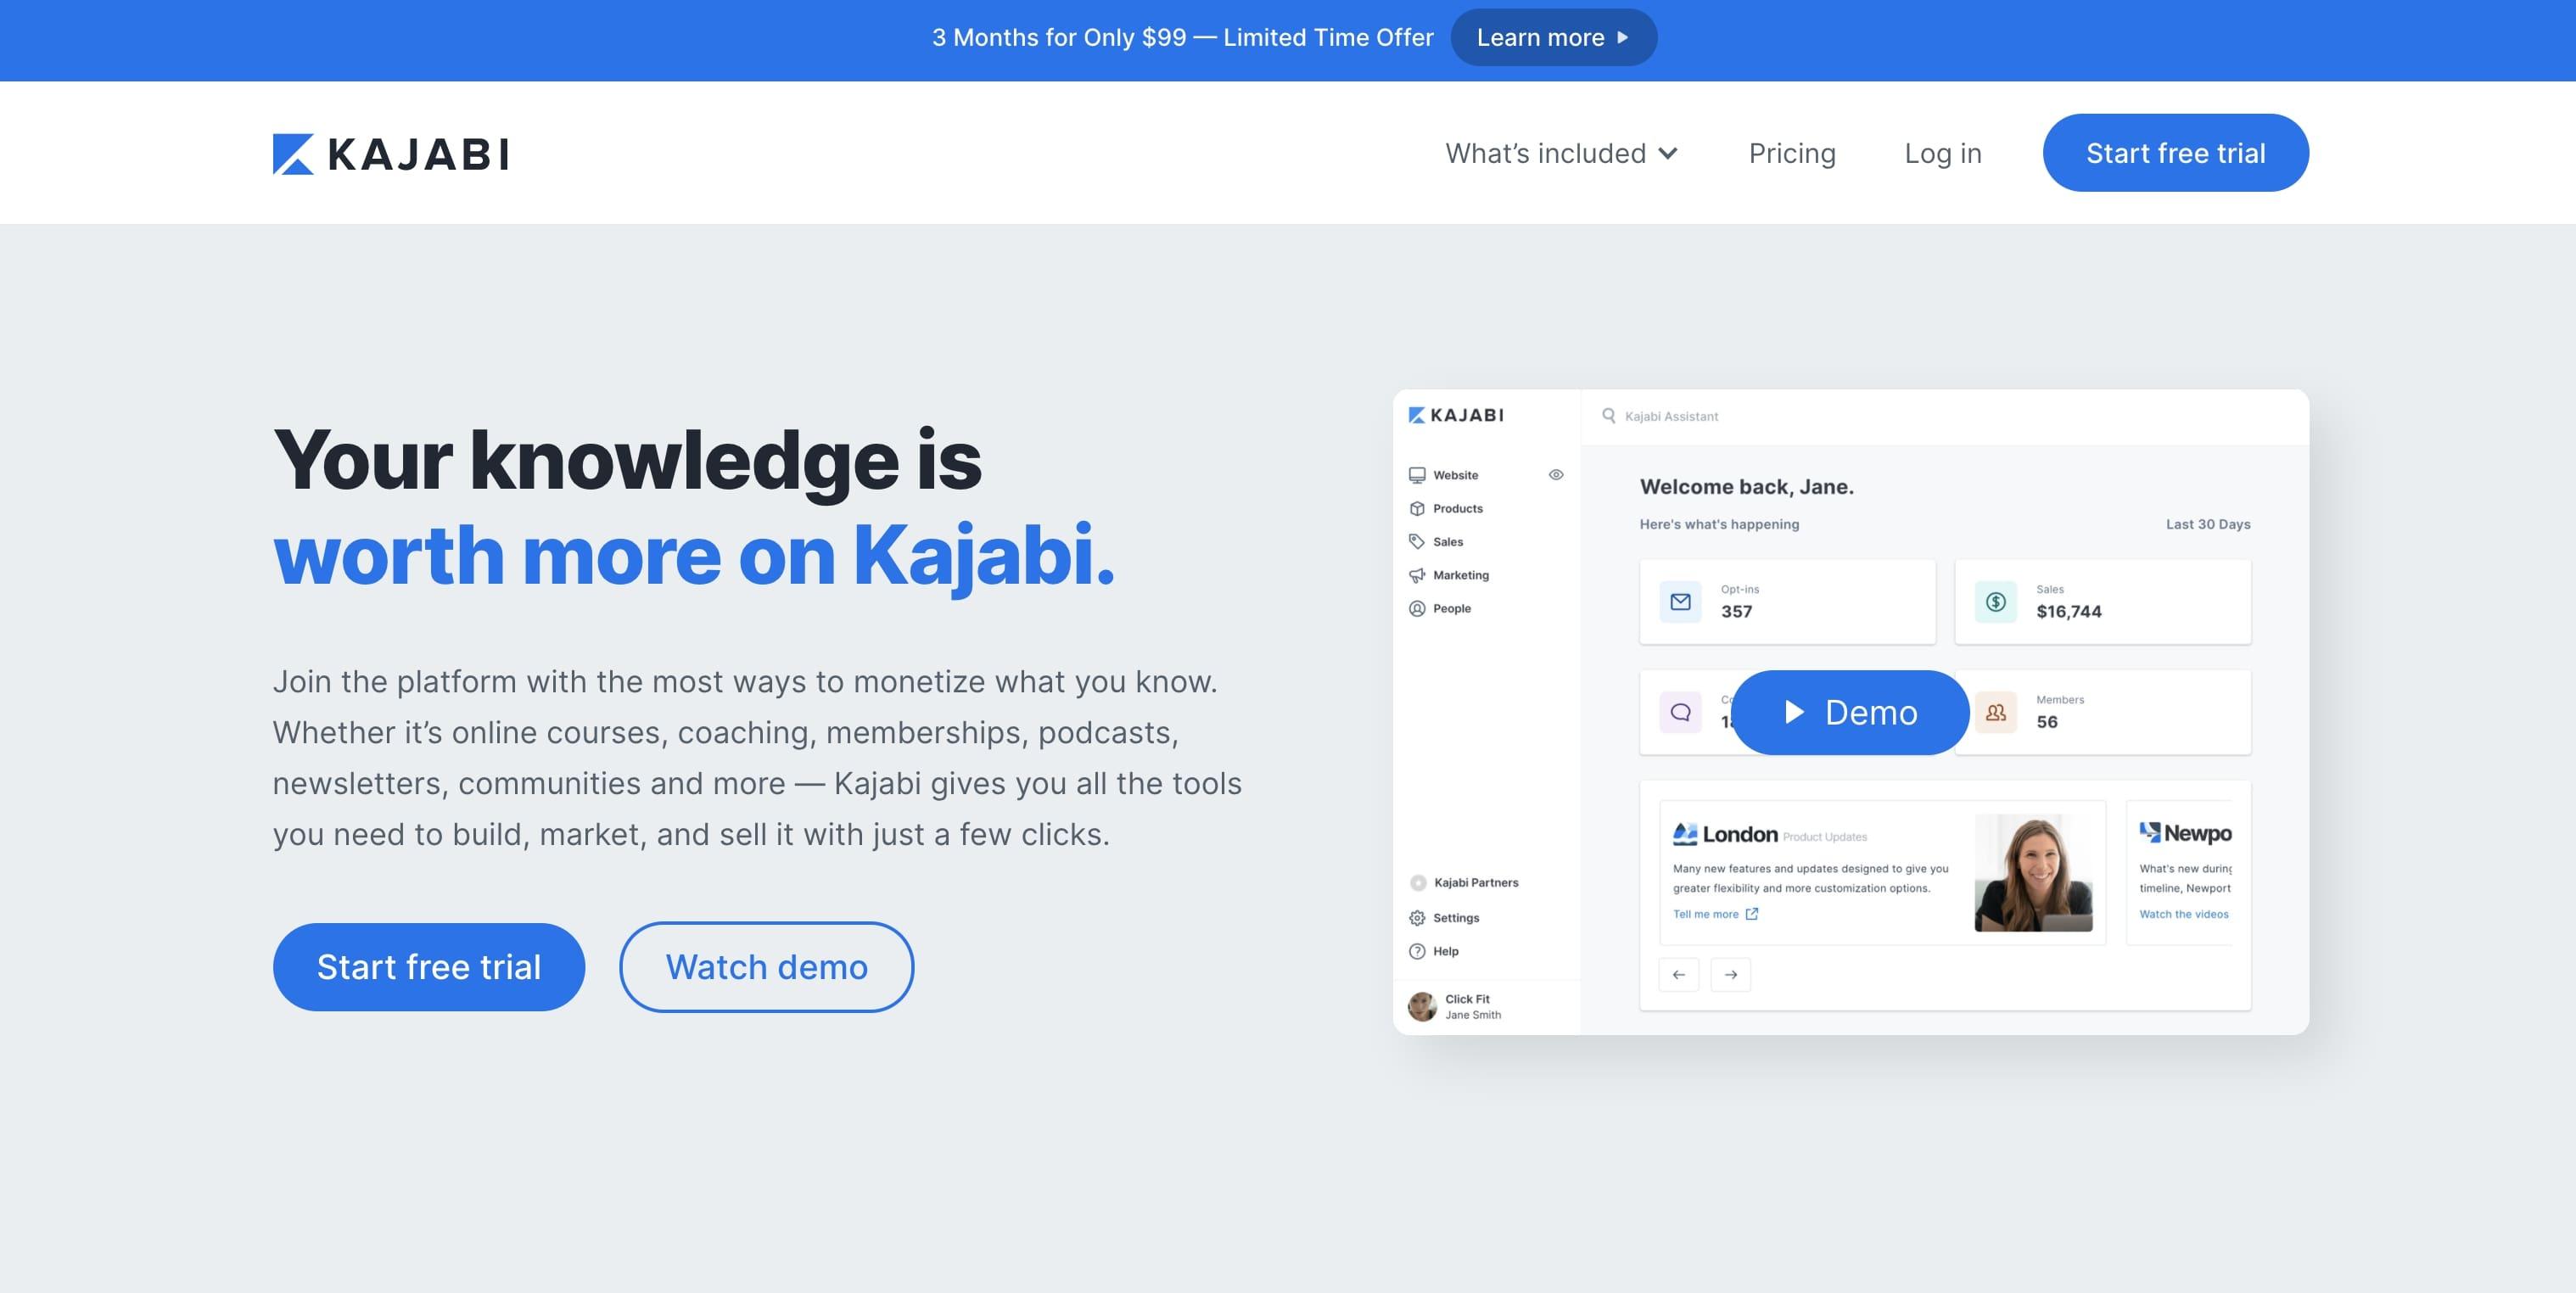 An image of the Kajabi website.